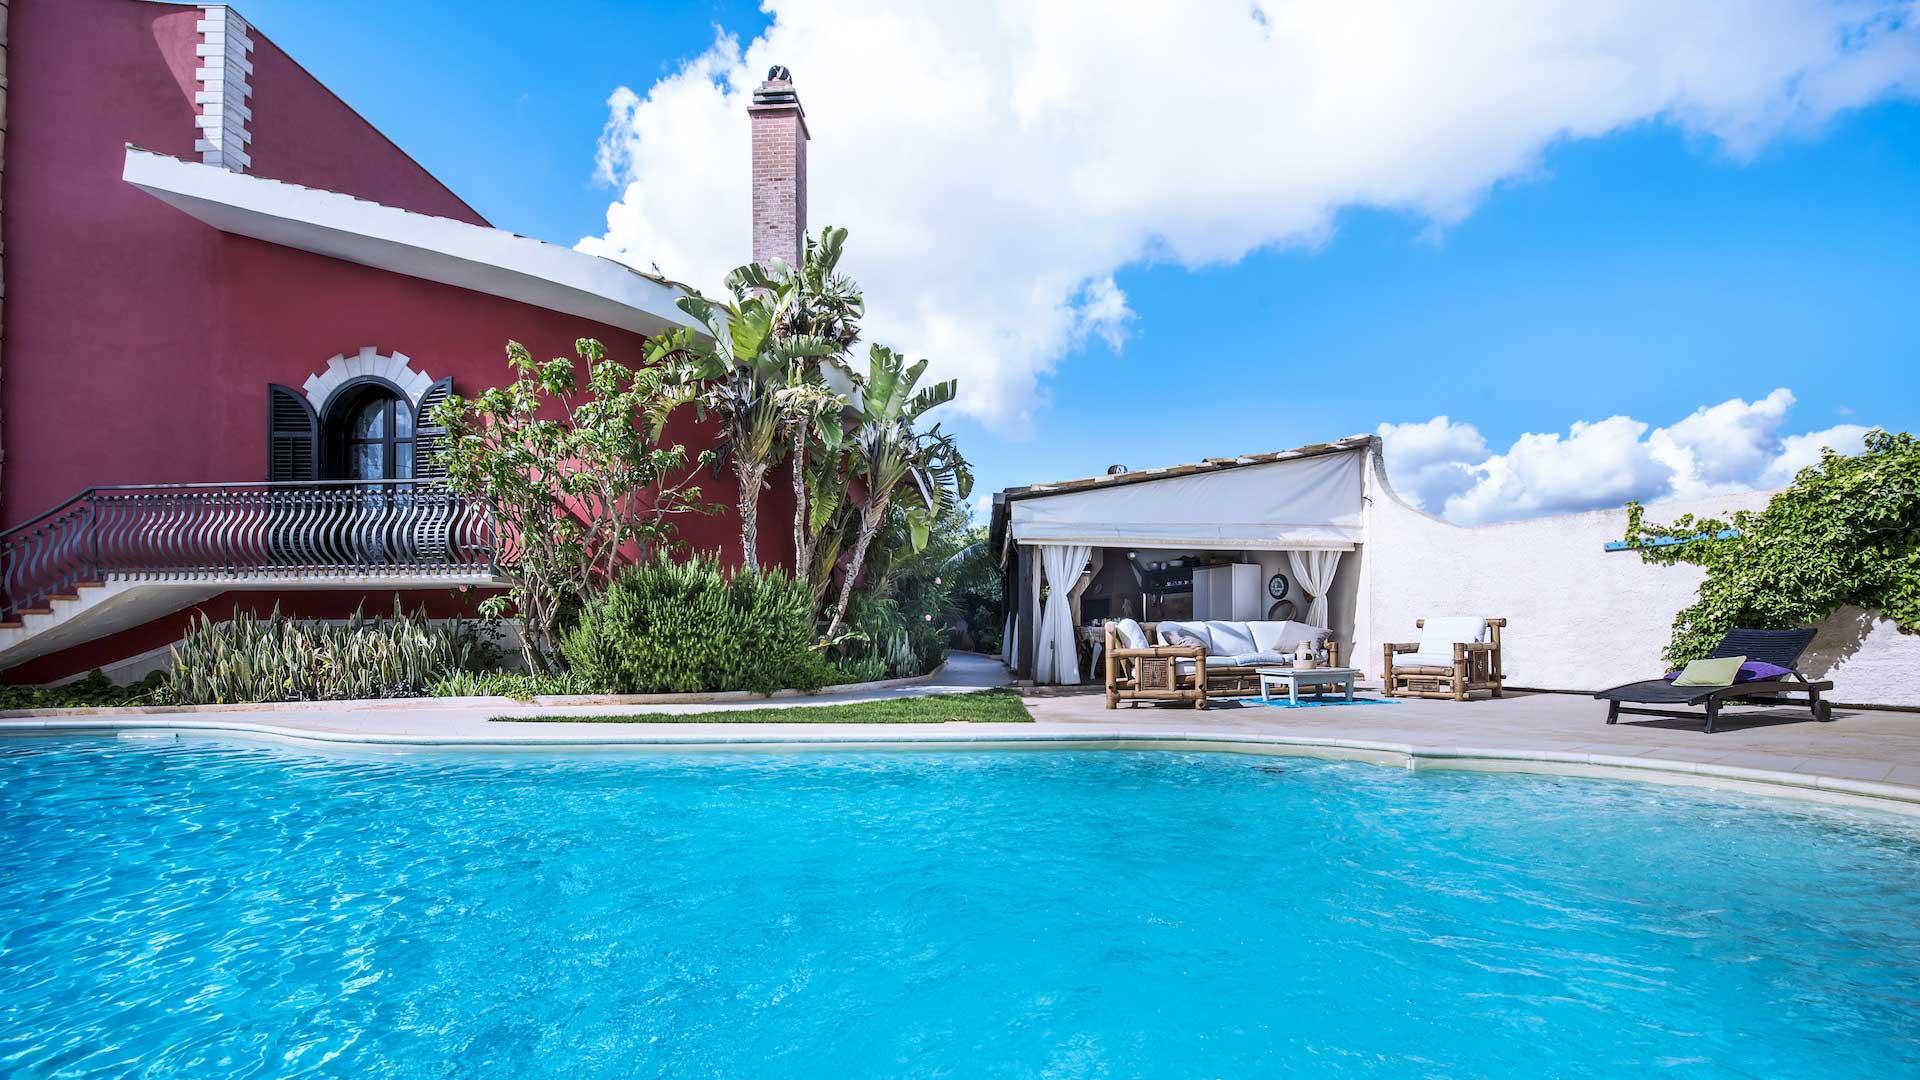 Villa Mazara - Villa rental in Sicily, Western Sicily ...